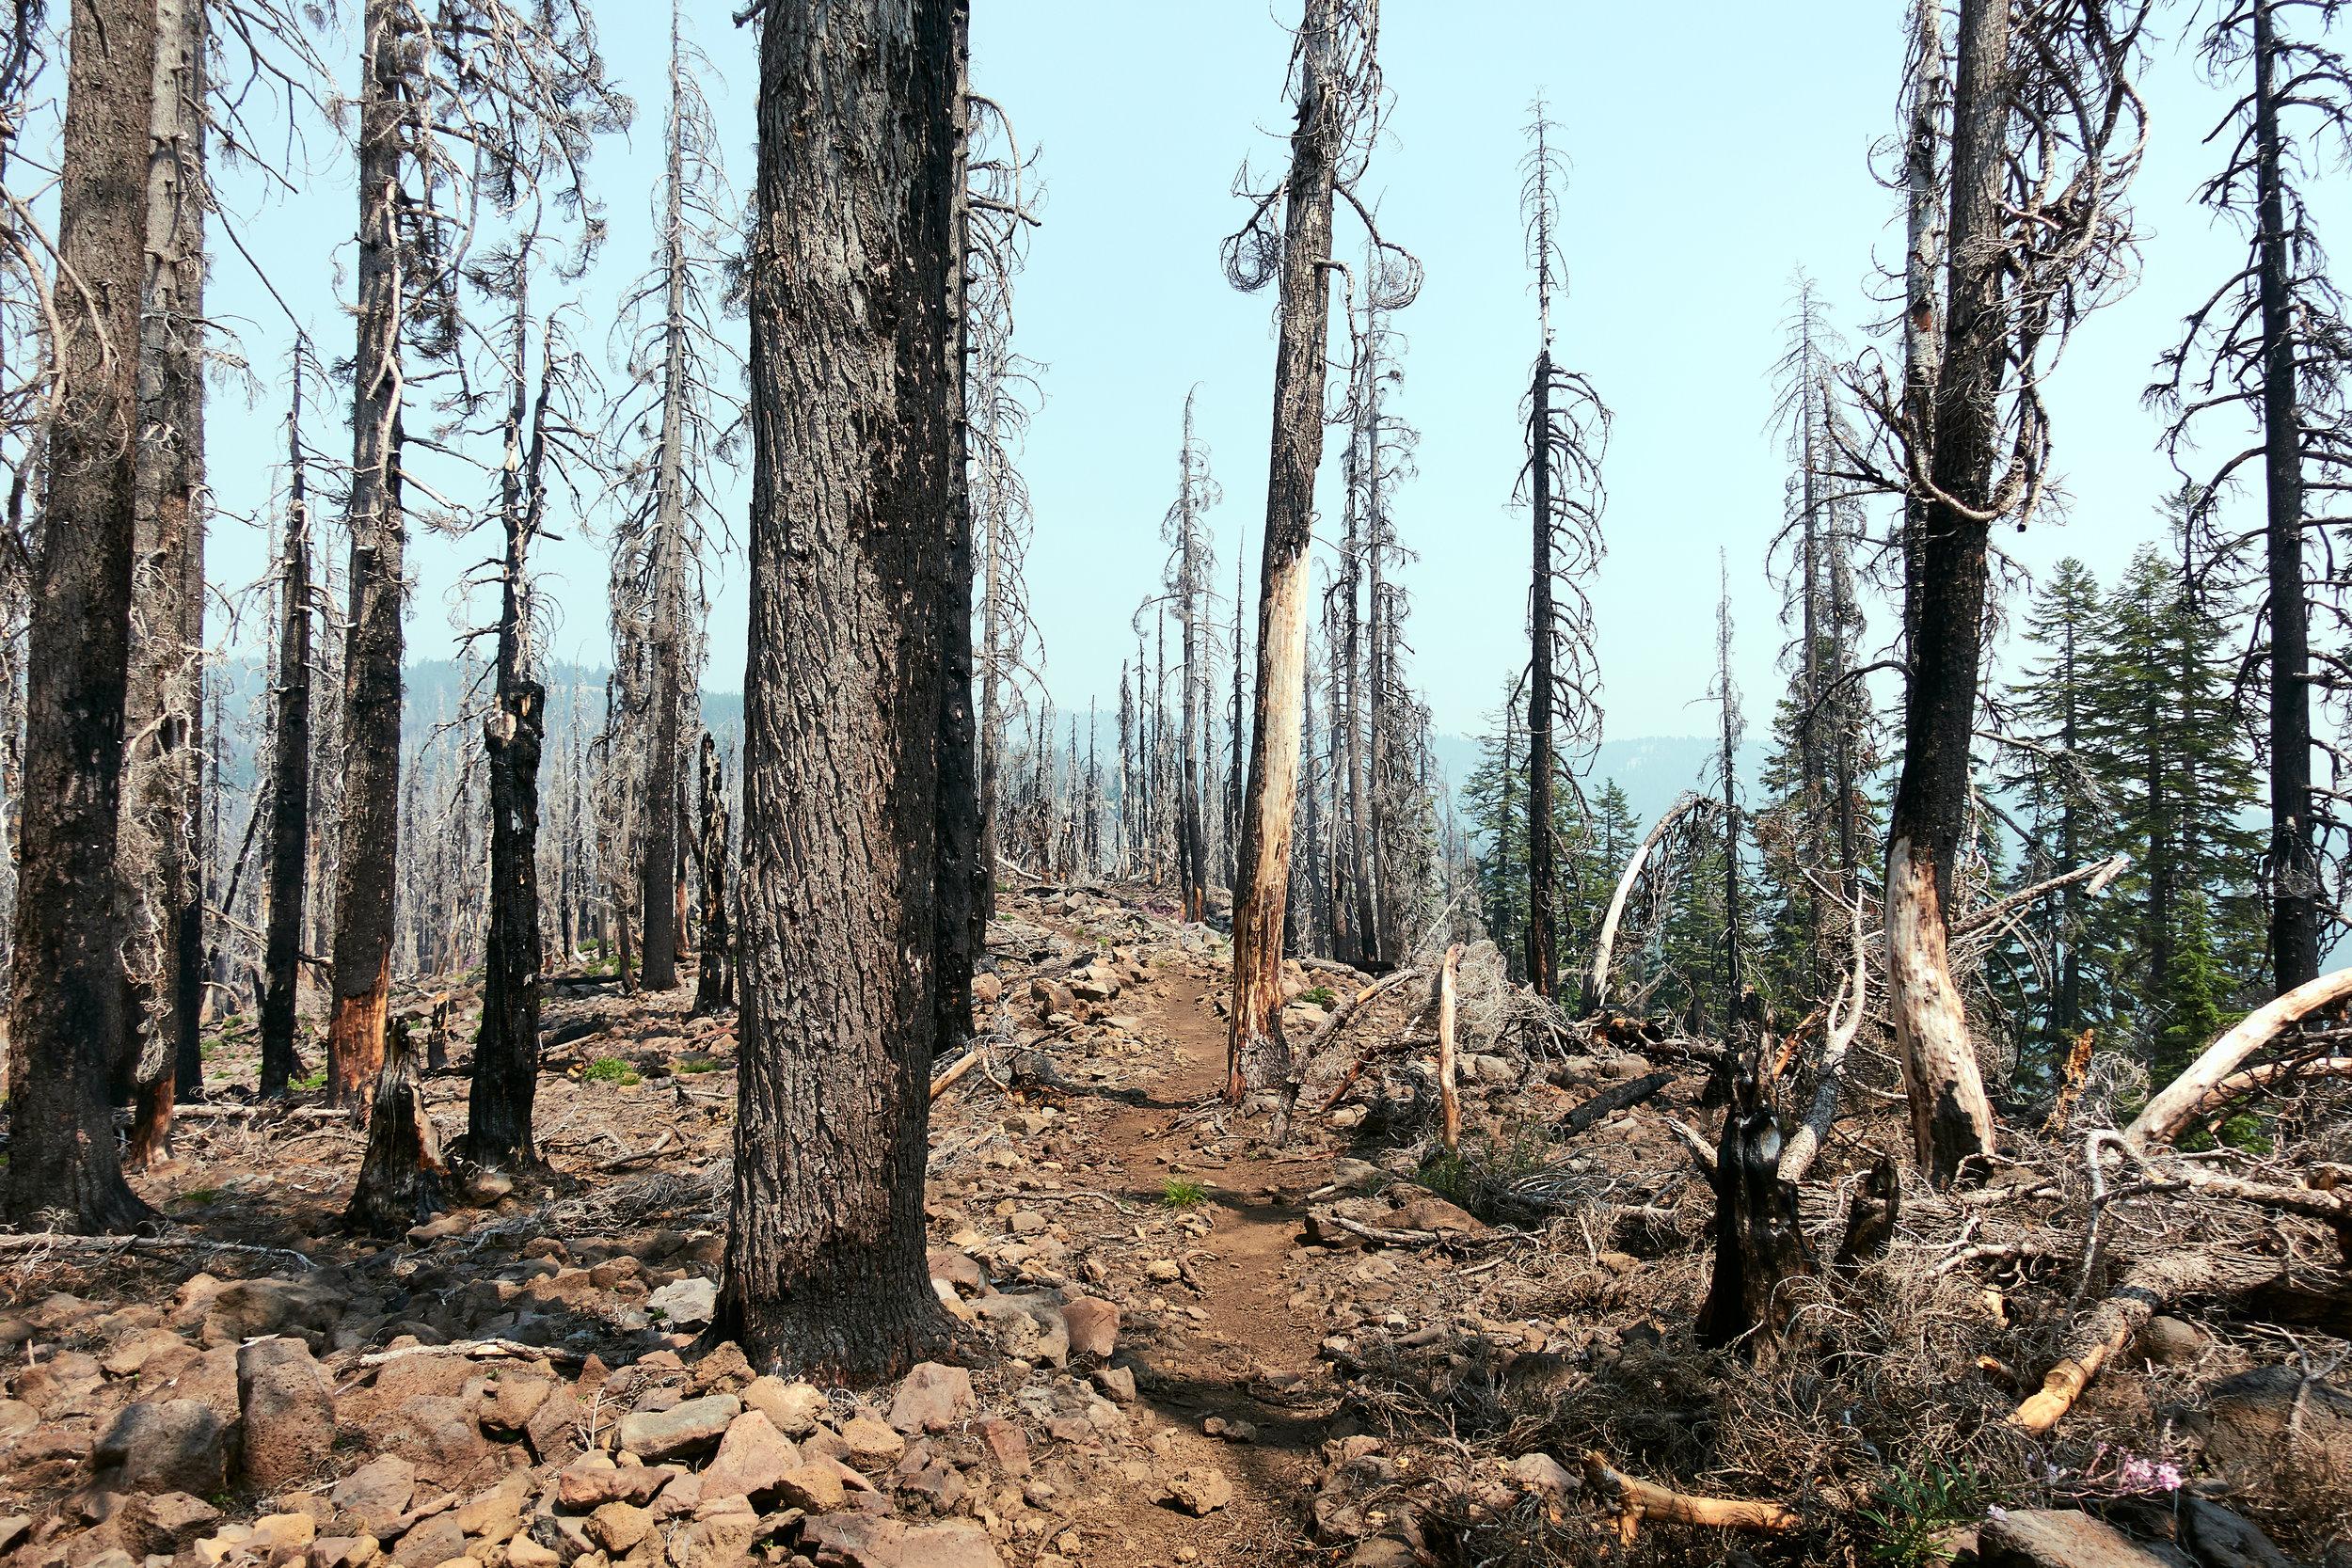 Walking through many burn areas.